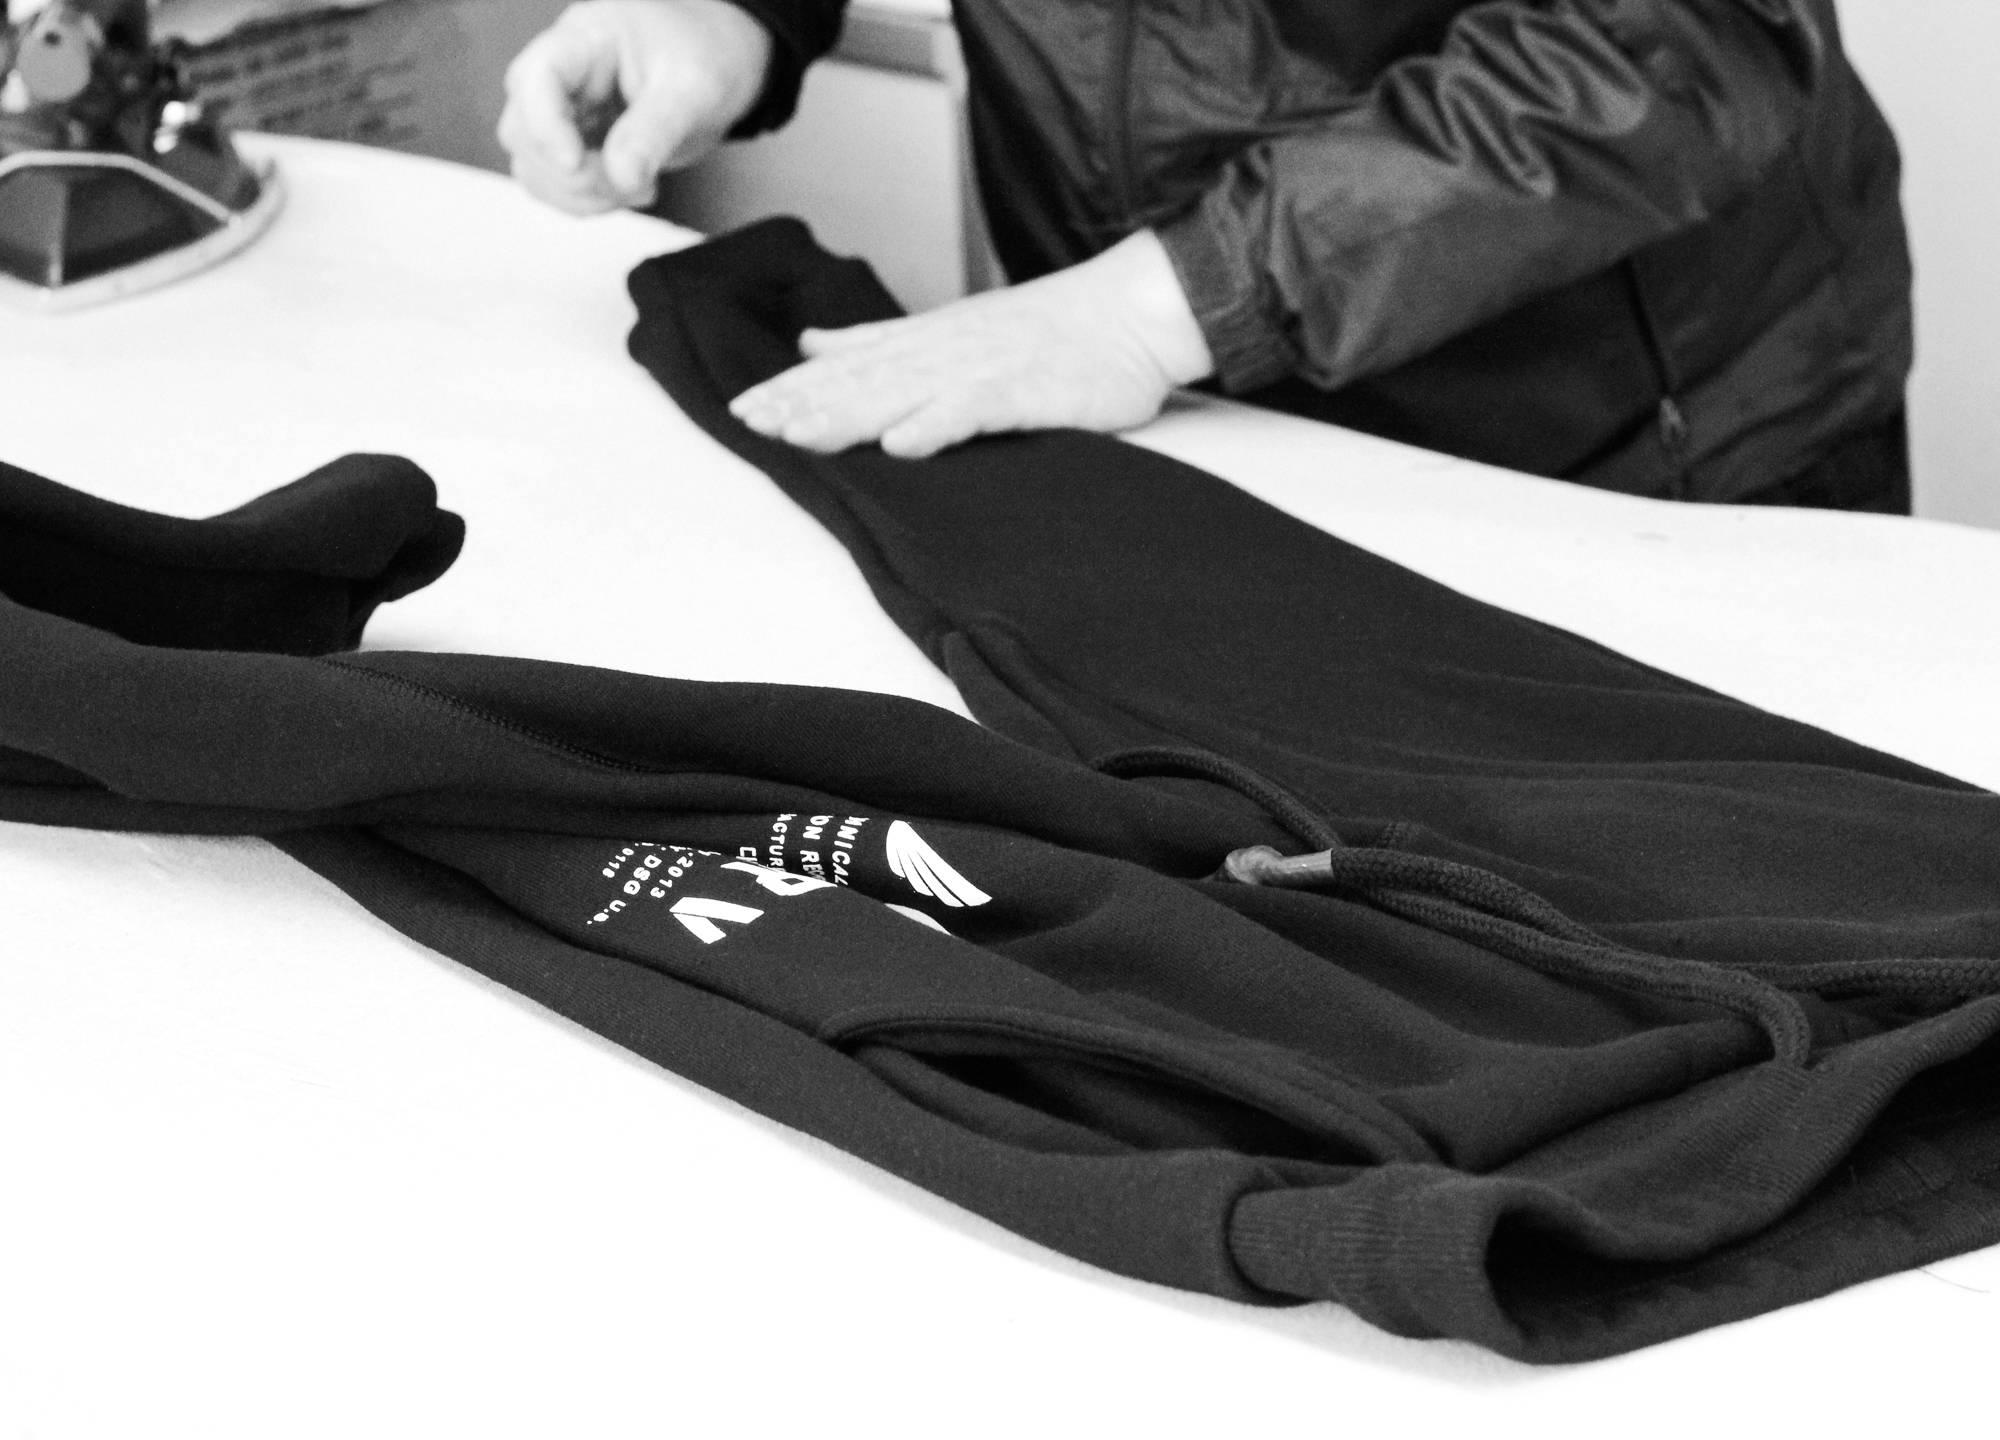 malinwear manufacturing